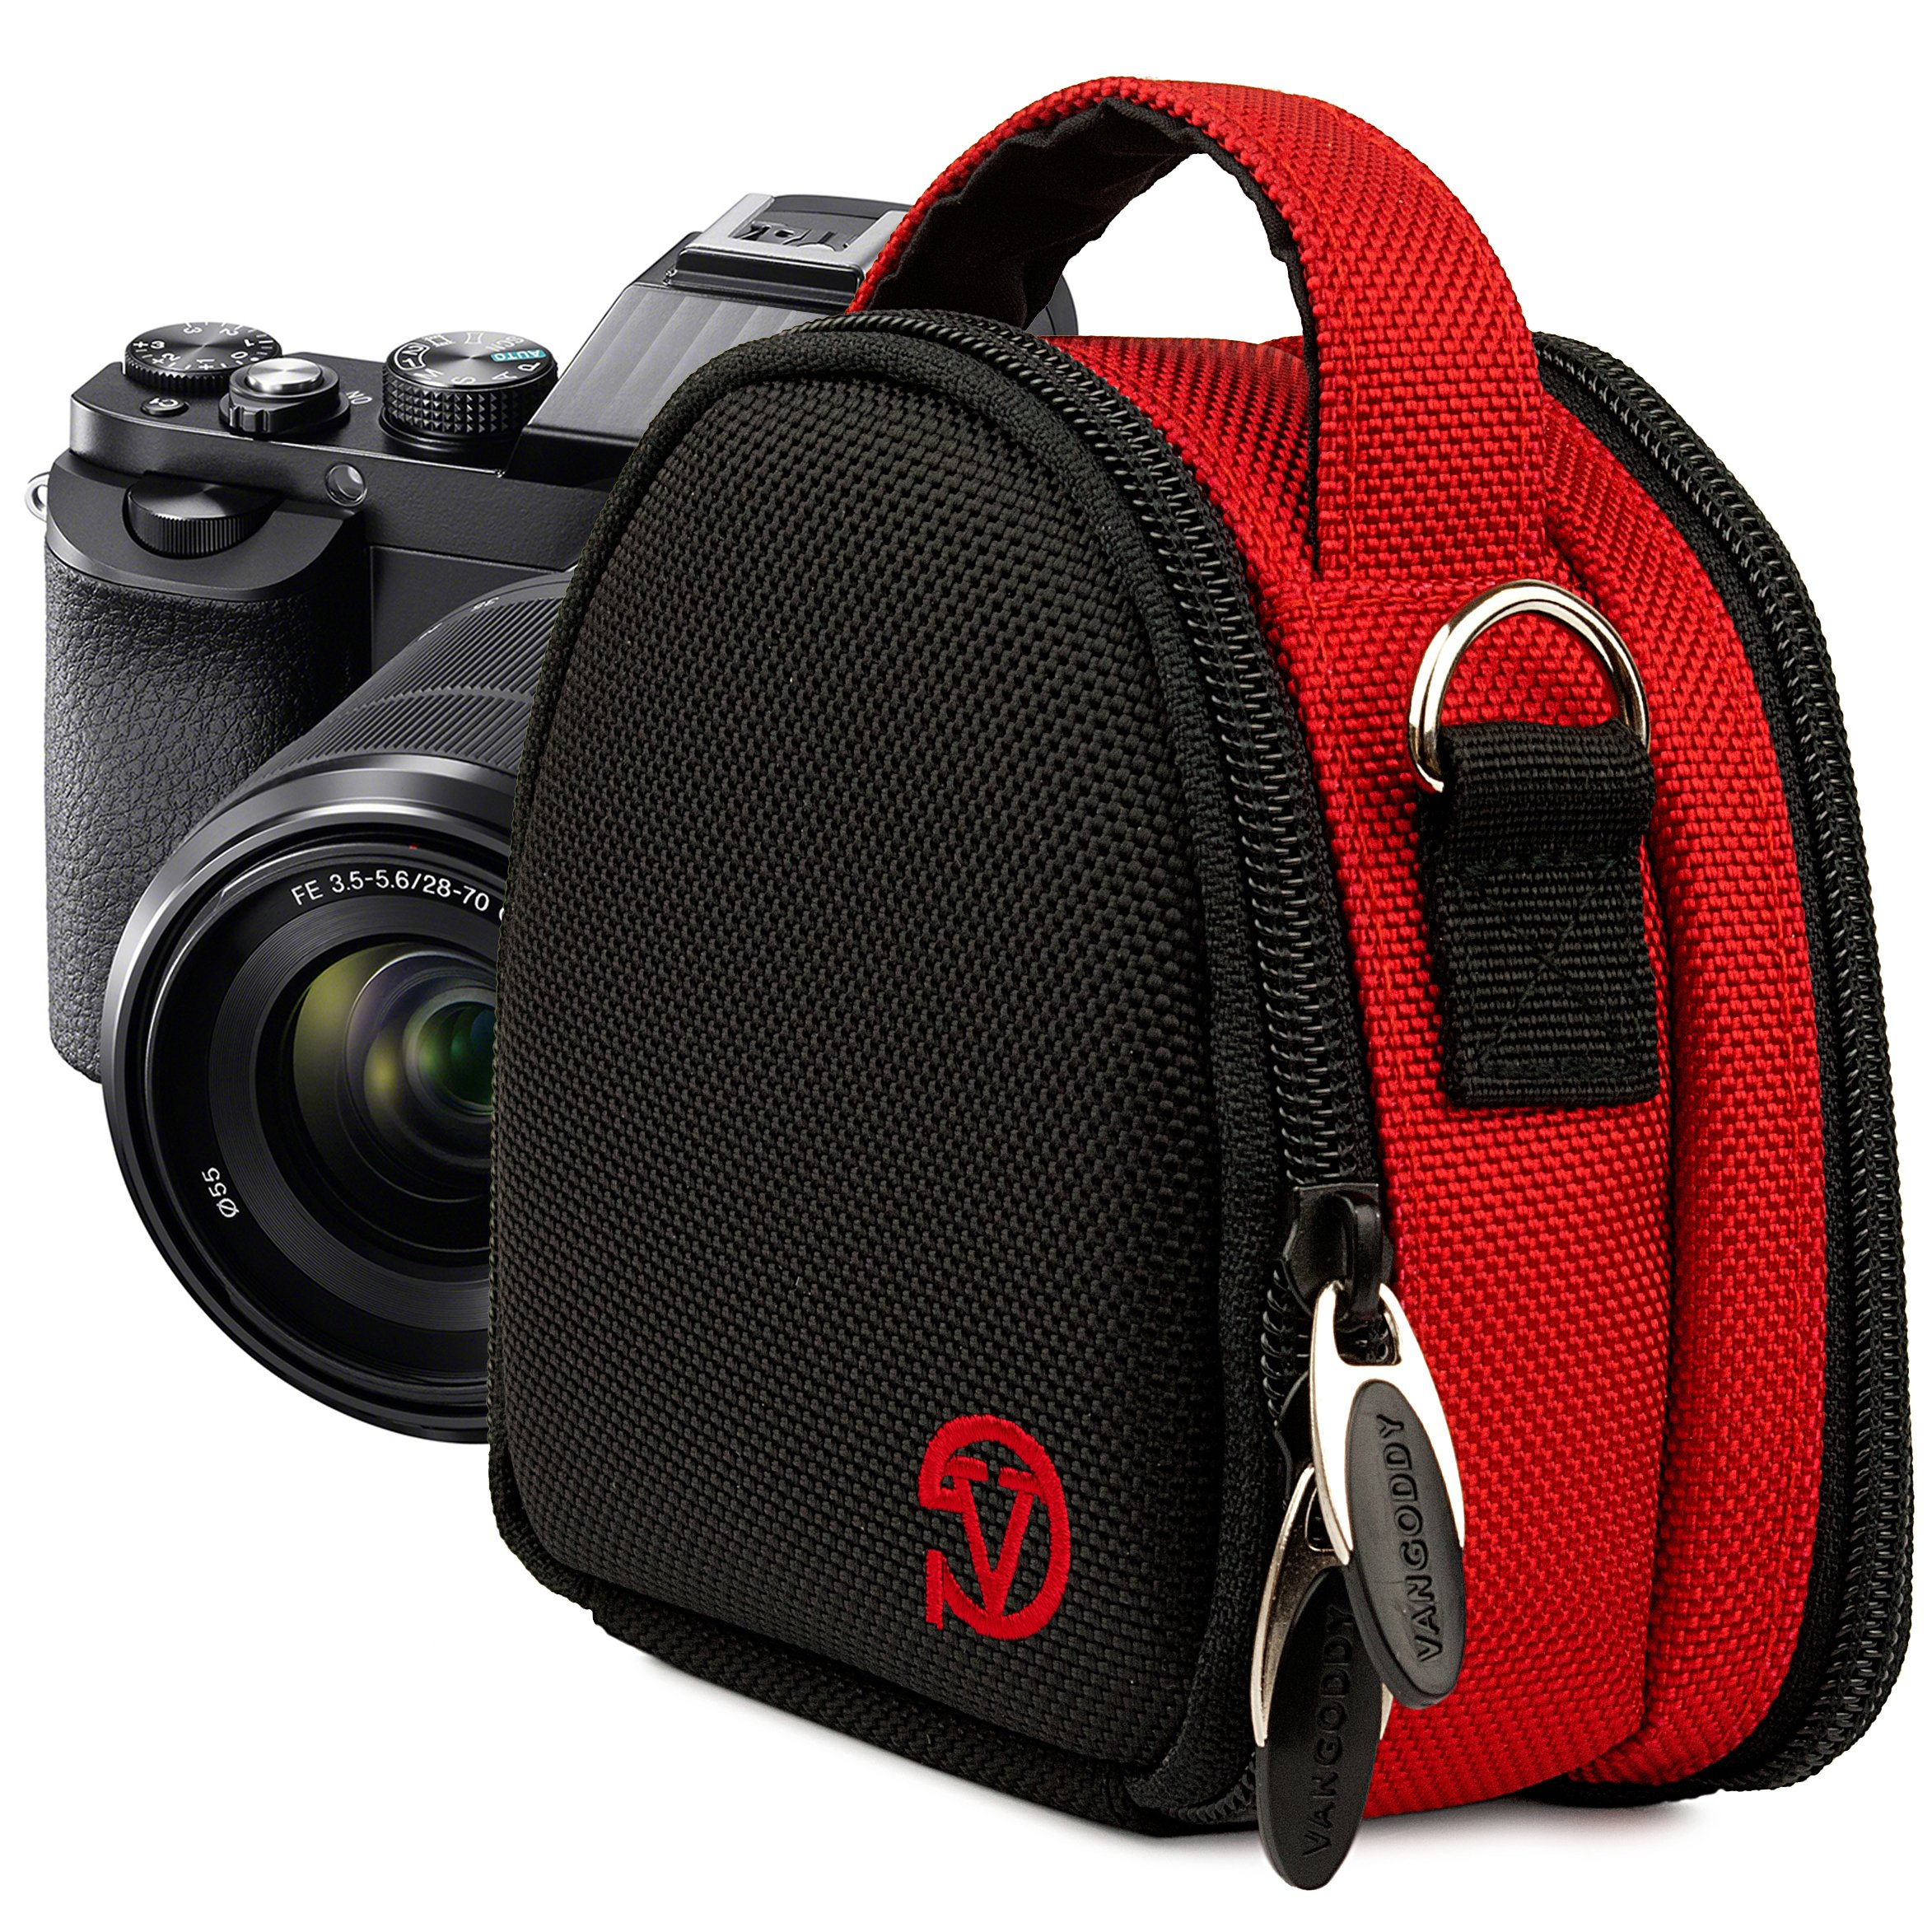 VanGoddy Compact Mini Laurel Red Camera Pouch for Samsung : Smart (WB800F, WB250F, WB150F, WB30F, DV150F, WB50F, WB35F), ST72